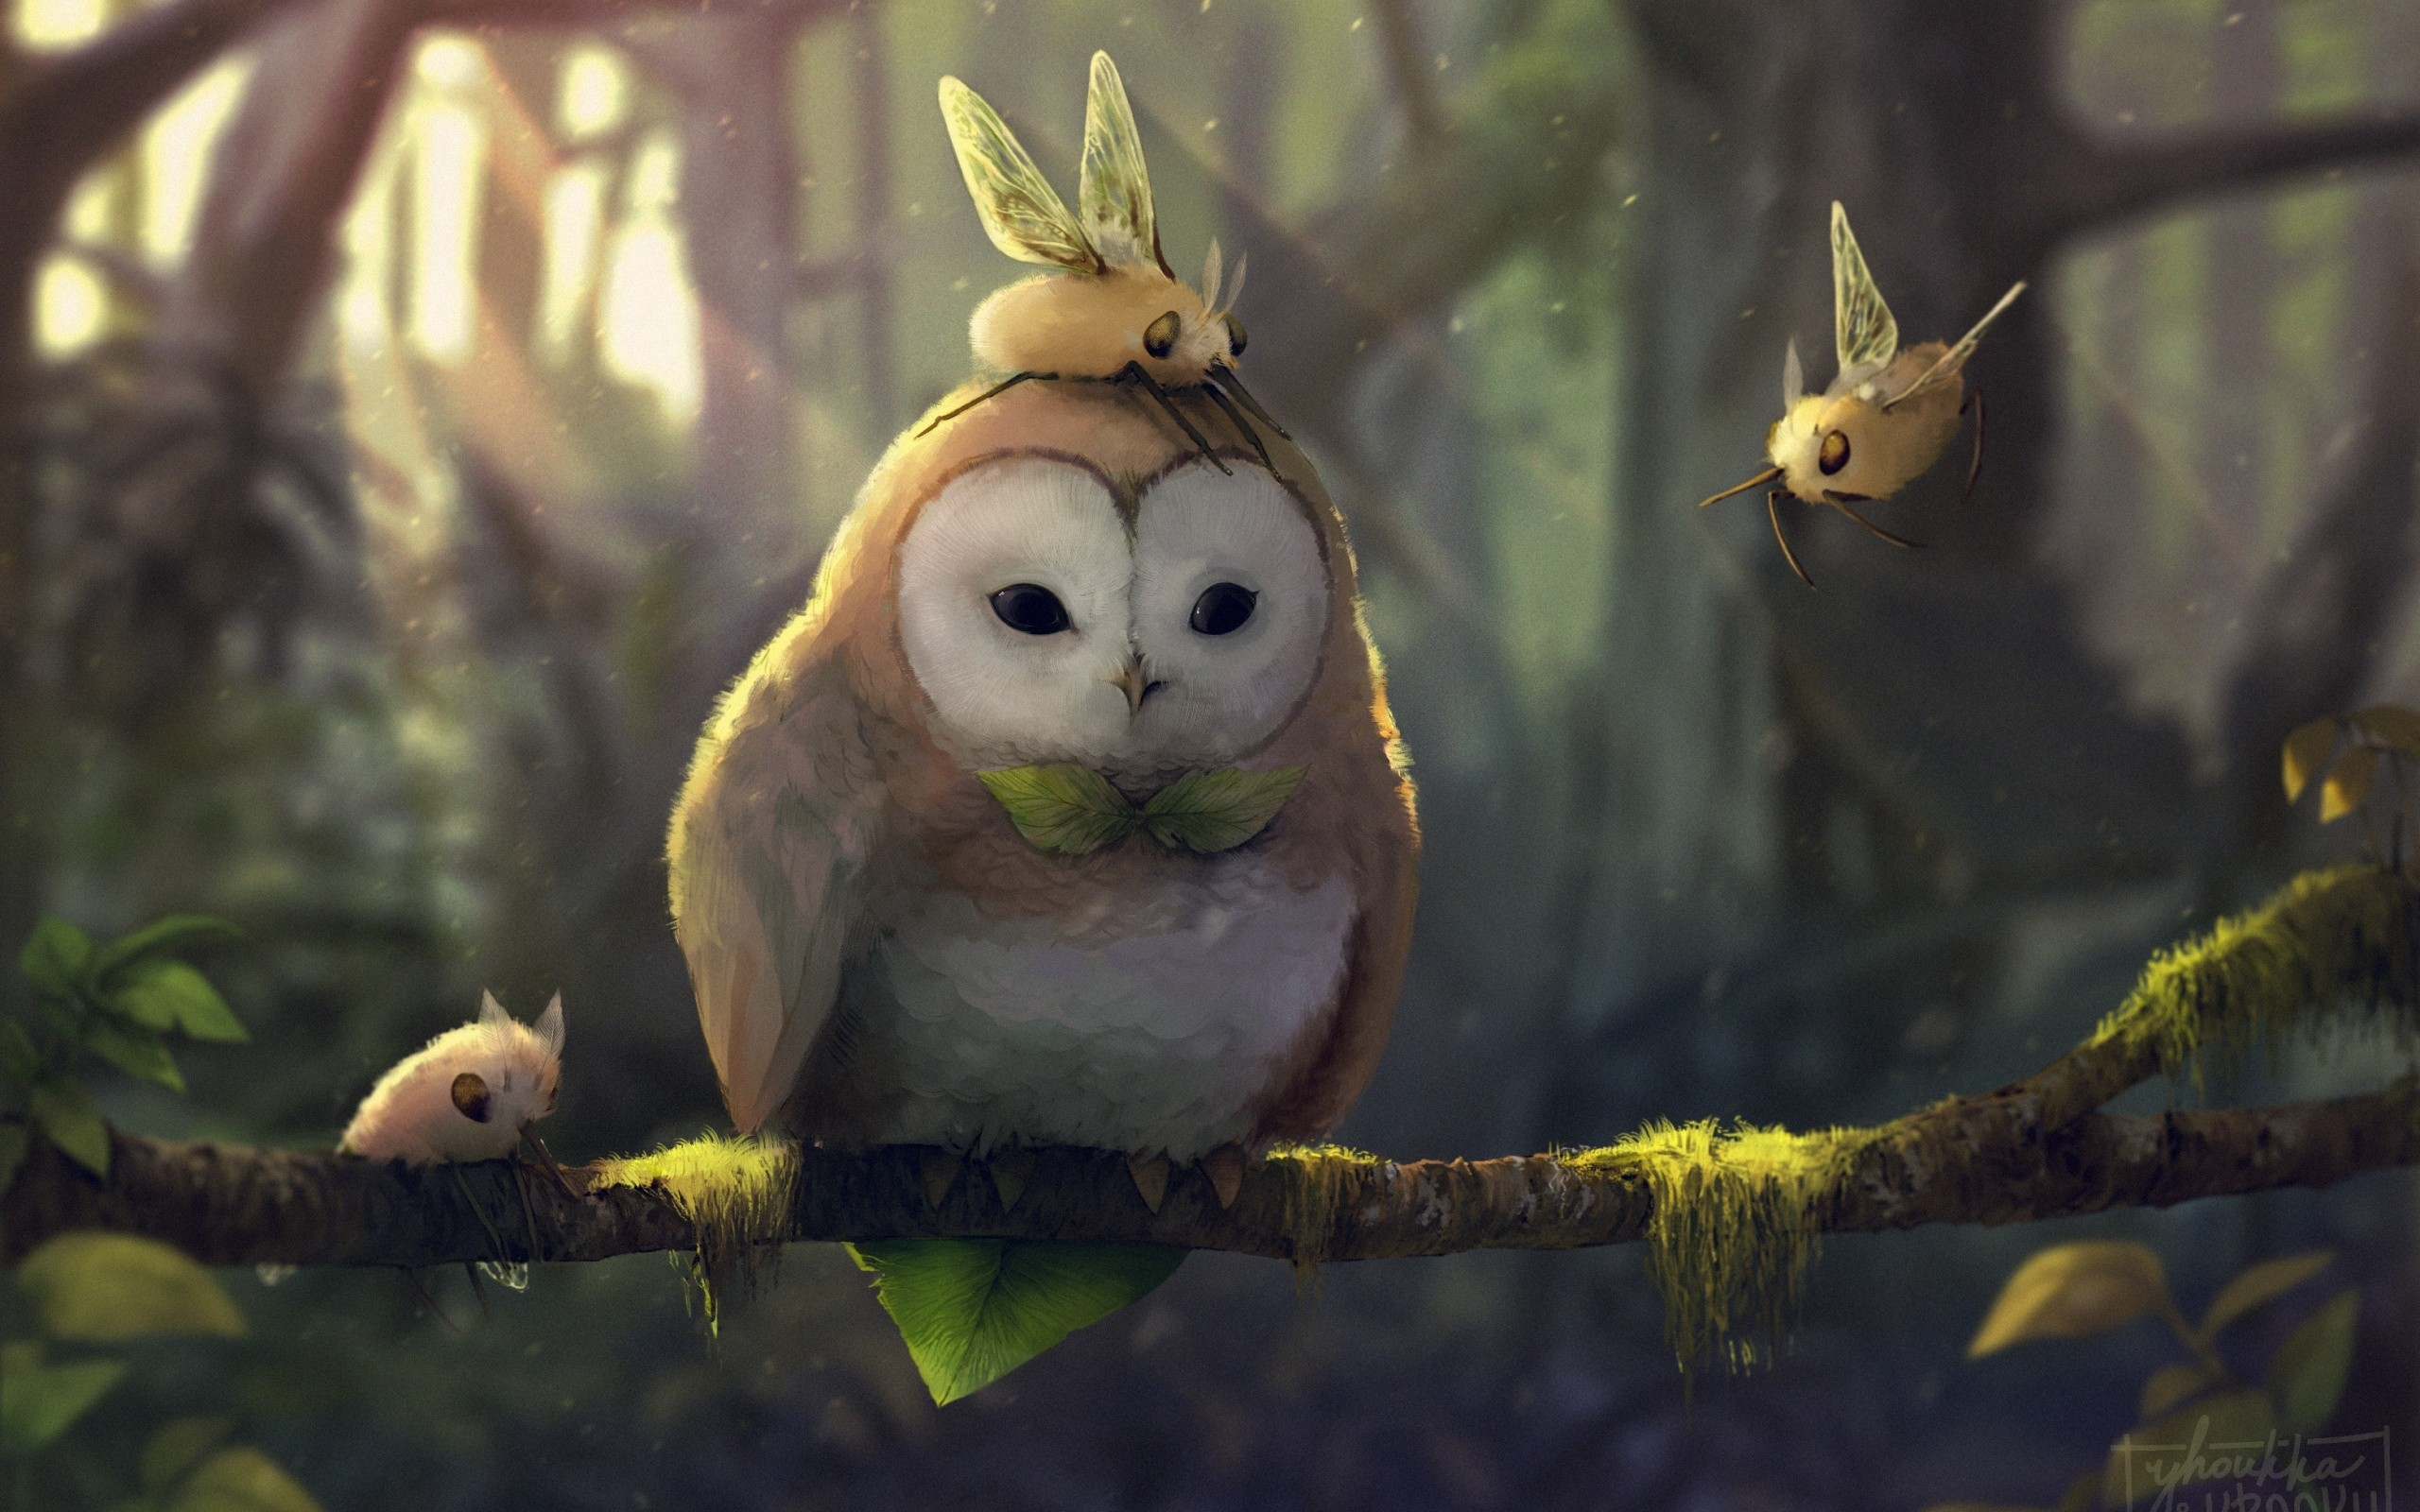 Fall Owl Wallpapers デスクトップ壁紙 ファンタジーアート 自然 アートワーク ブランチ ポクモ 野生動物 フクロウ